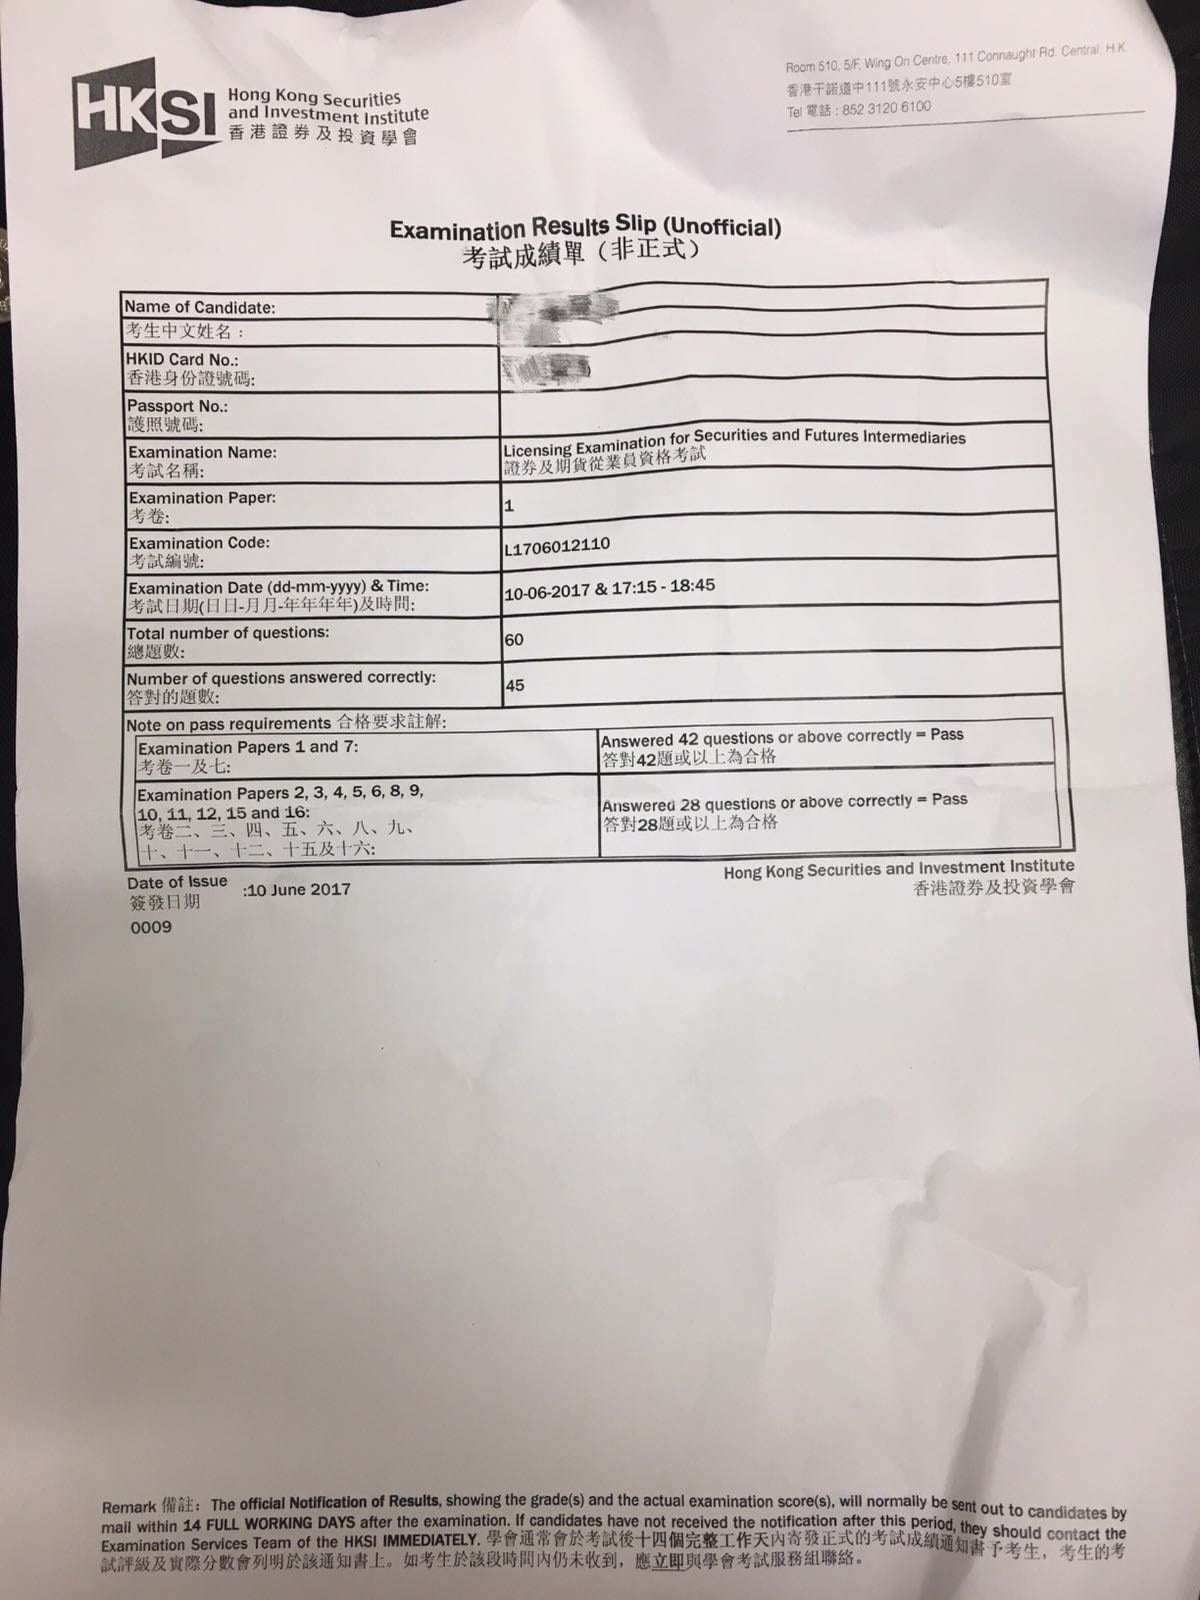 CHM 10/6/2017 LE Paper 1 證券期貨從業員資格考試卷一 Pass